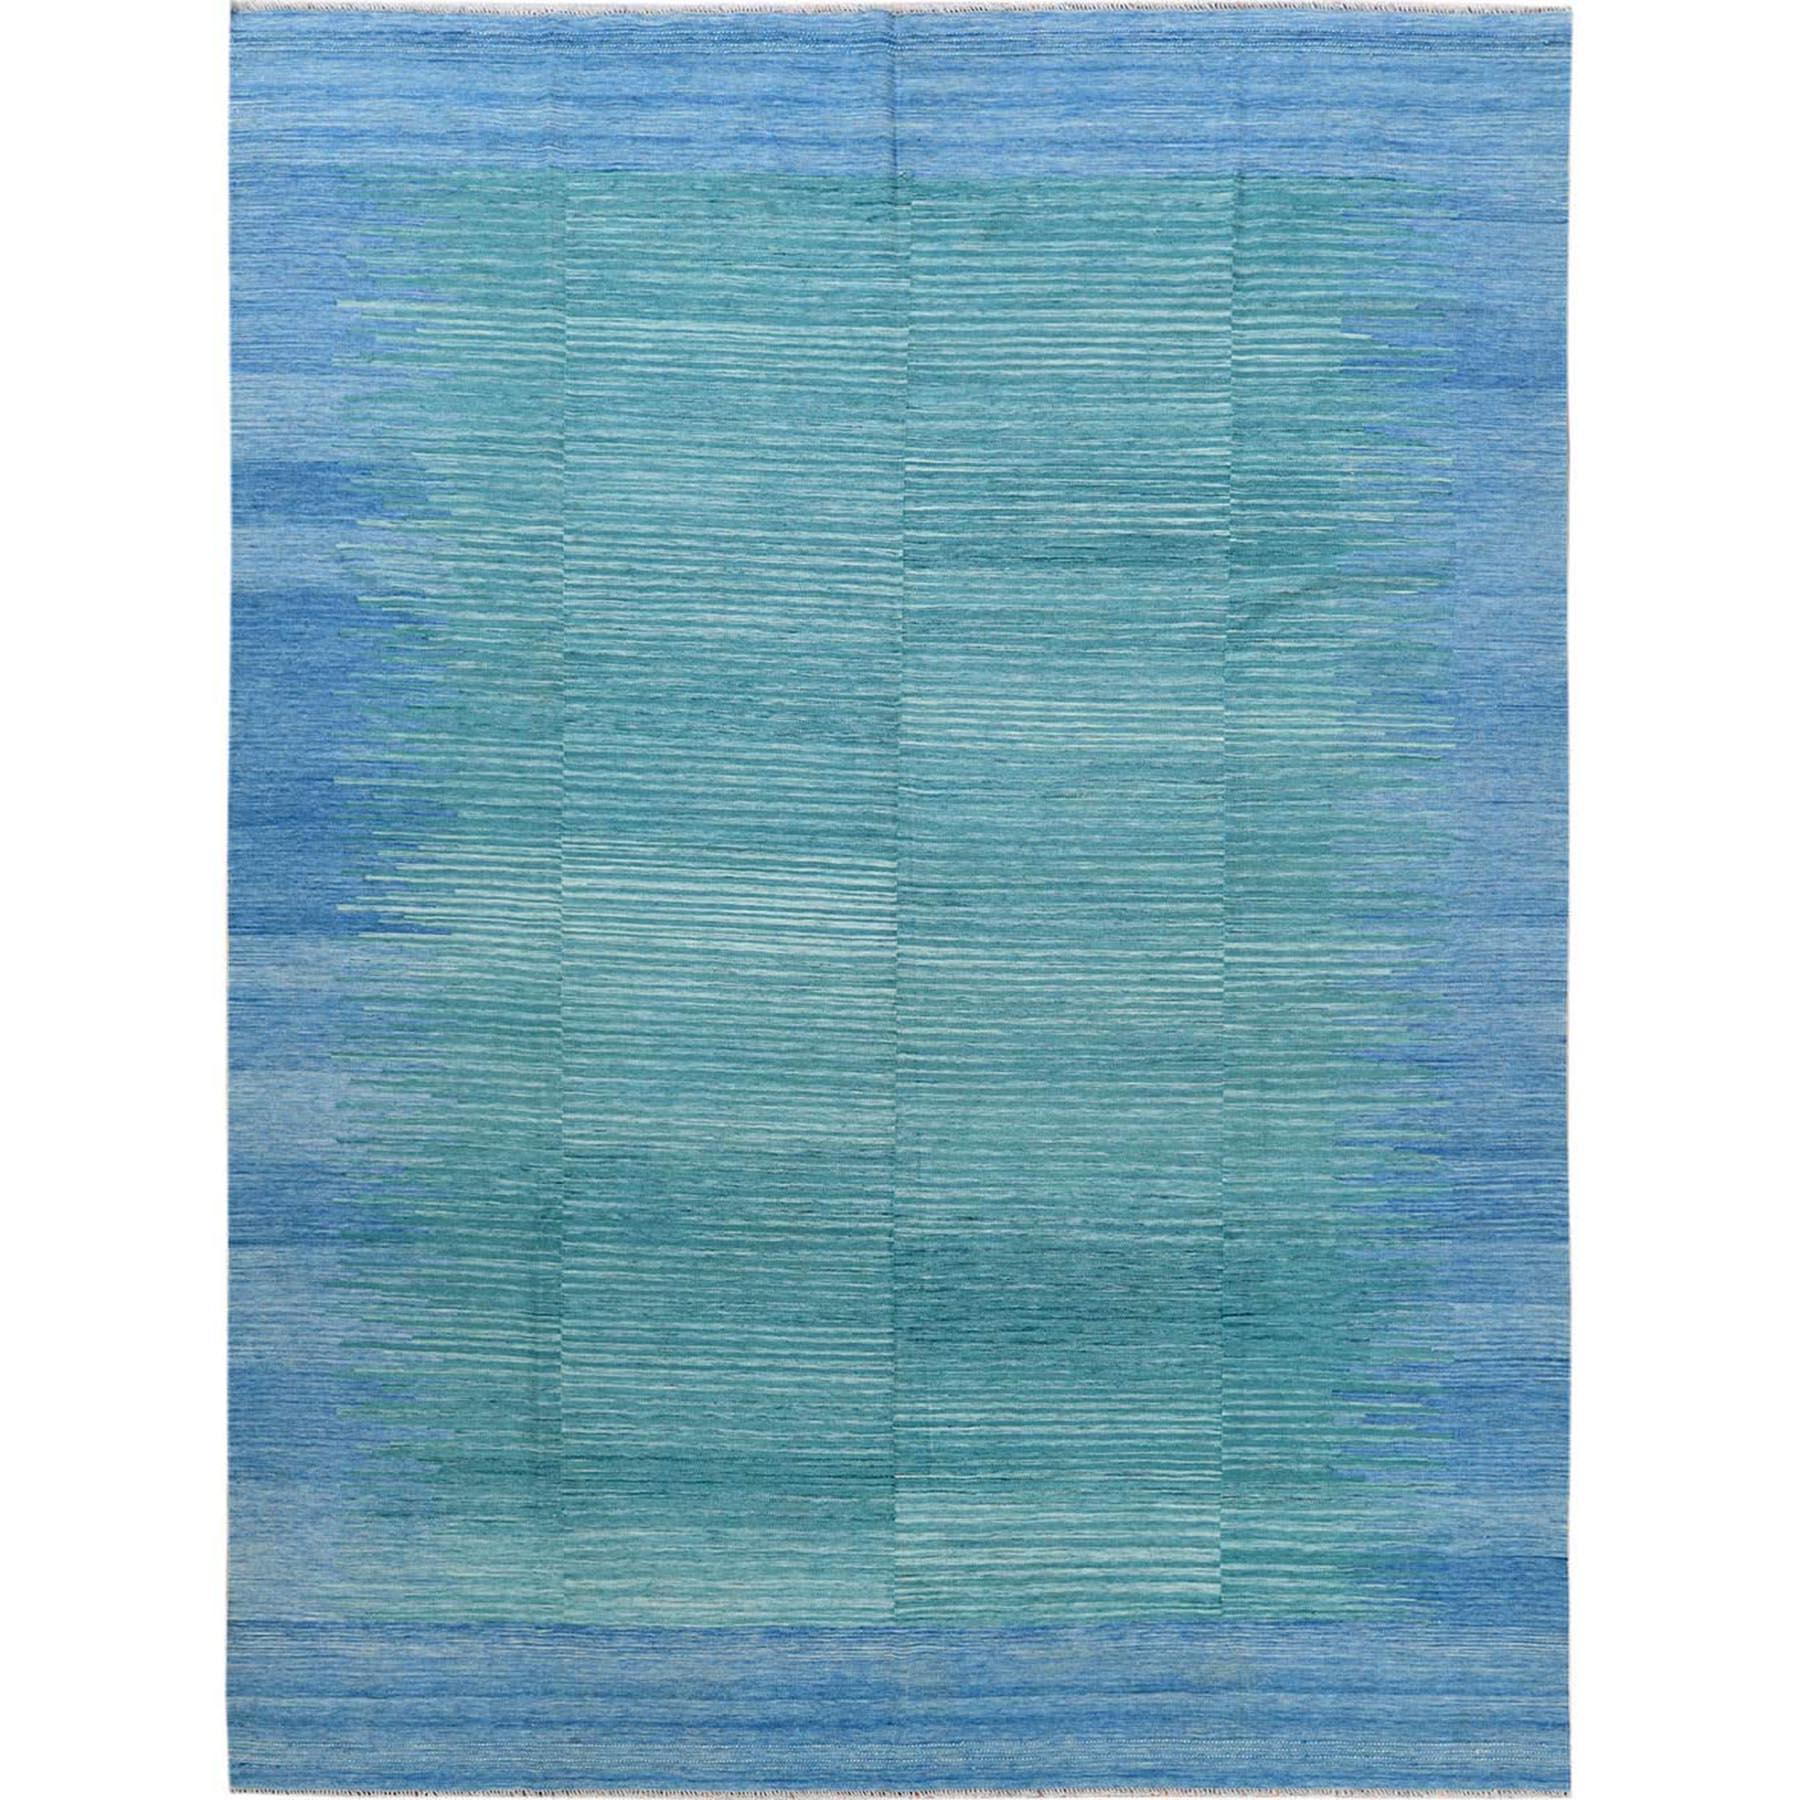 "9'1""x12' THE AQUAMARINE Hand Woven Flat Weave Kilim Natural Wool Reversible Oriental Rug"